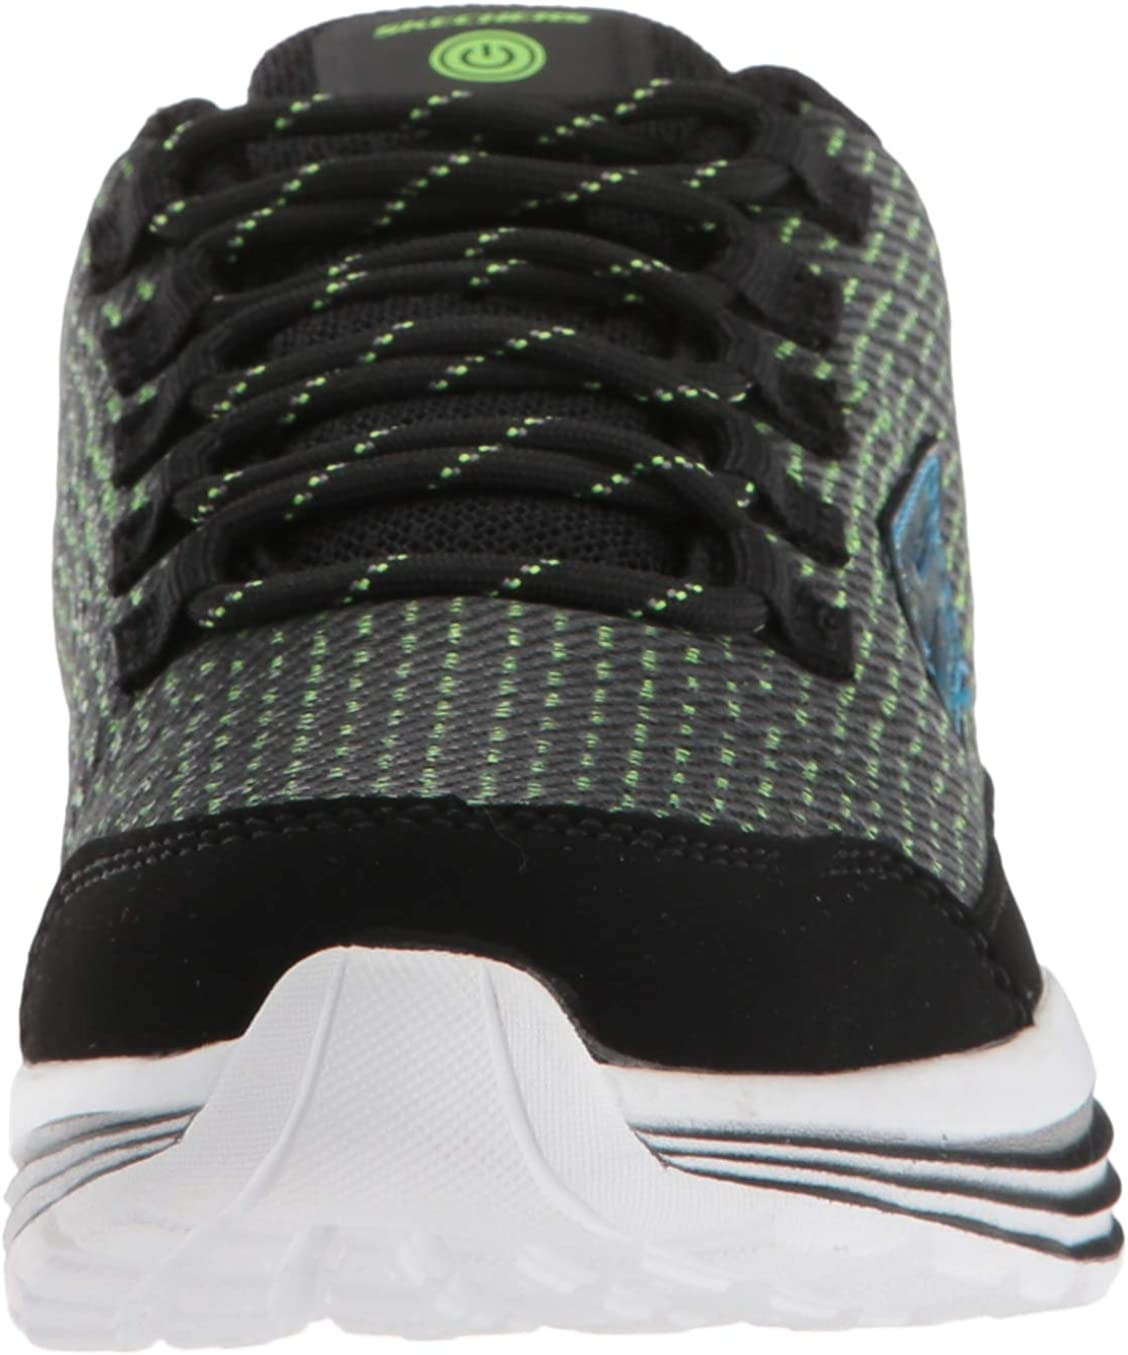 S Lights-Luminators Sneaker